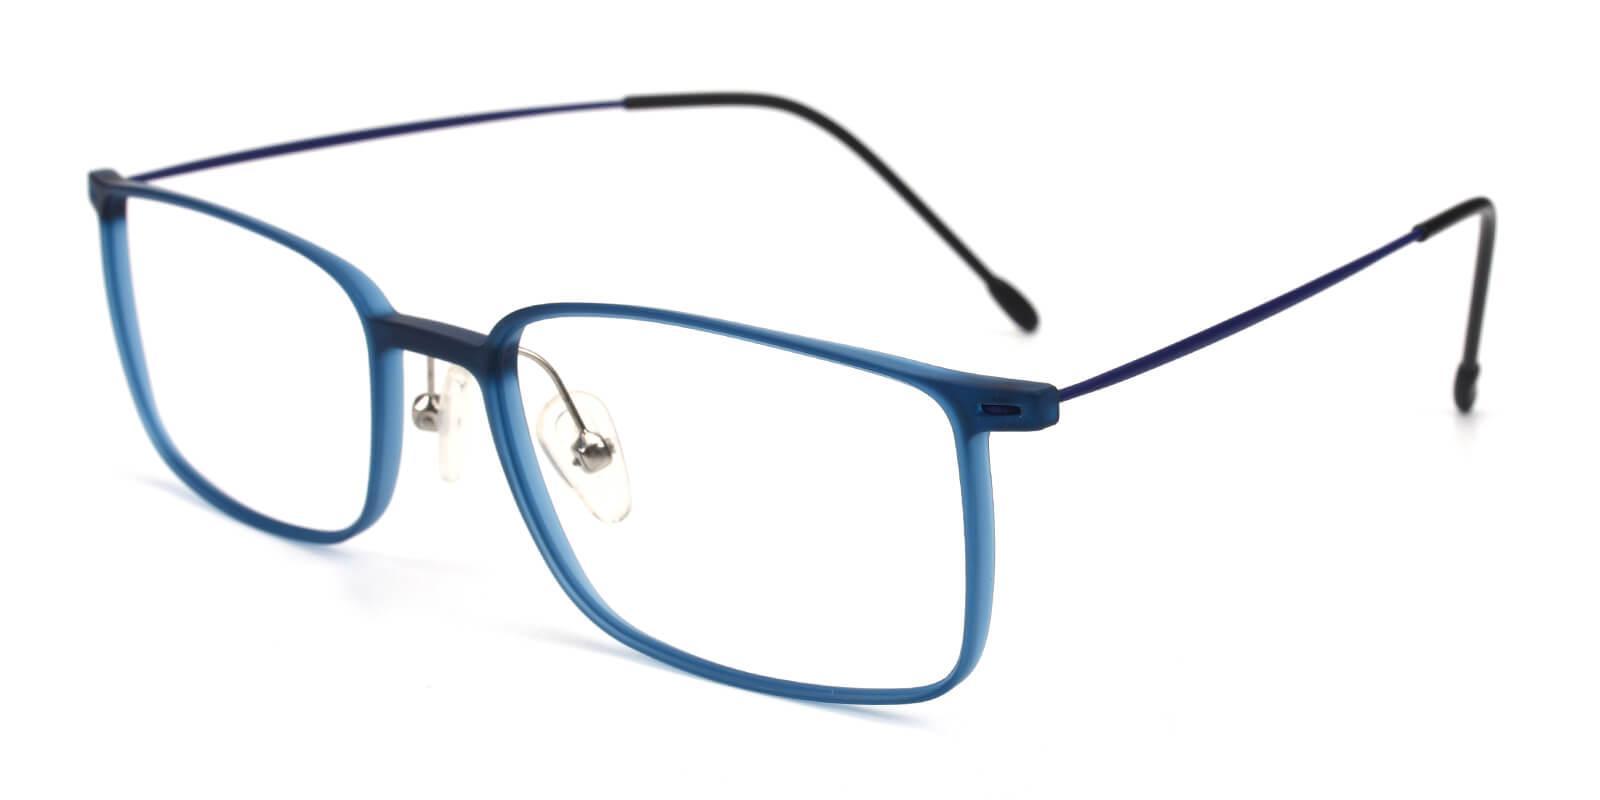 Glory-Blue-Rectangle-Combination-Eyeglasses-detail